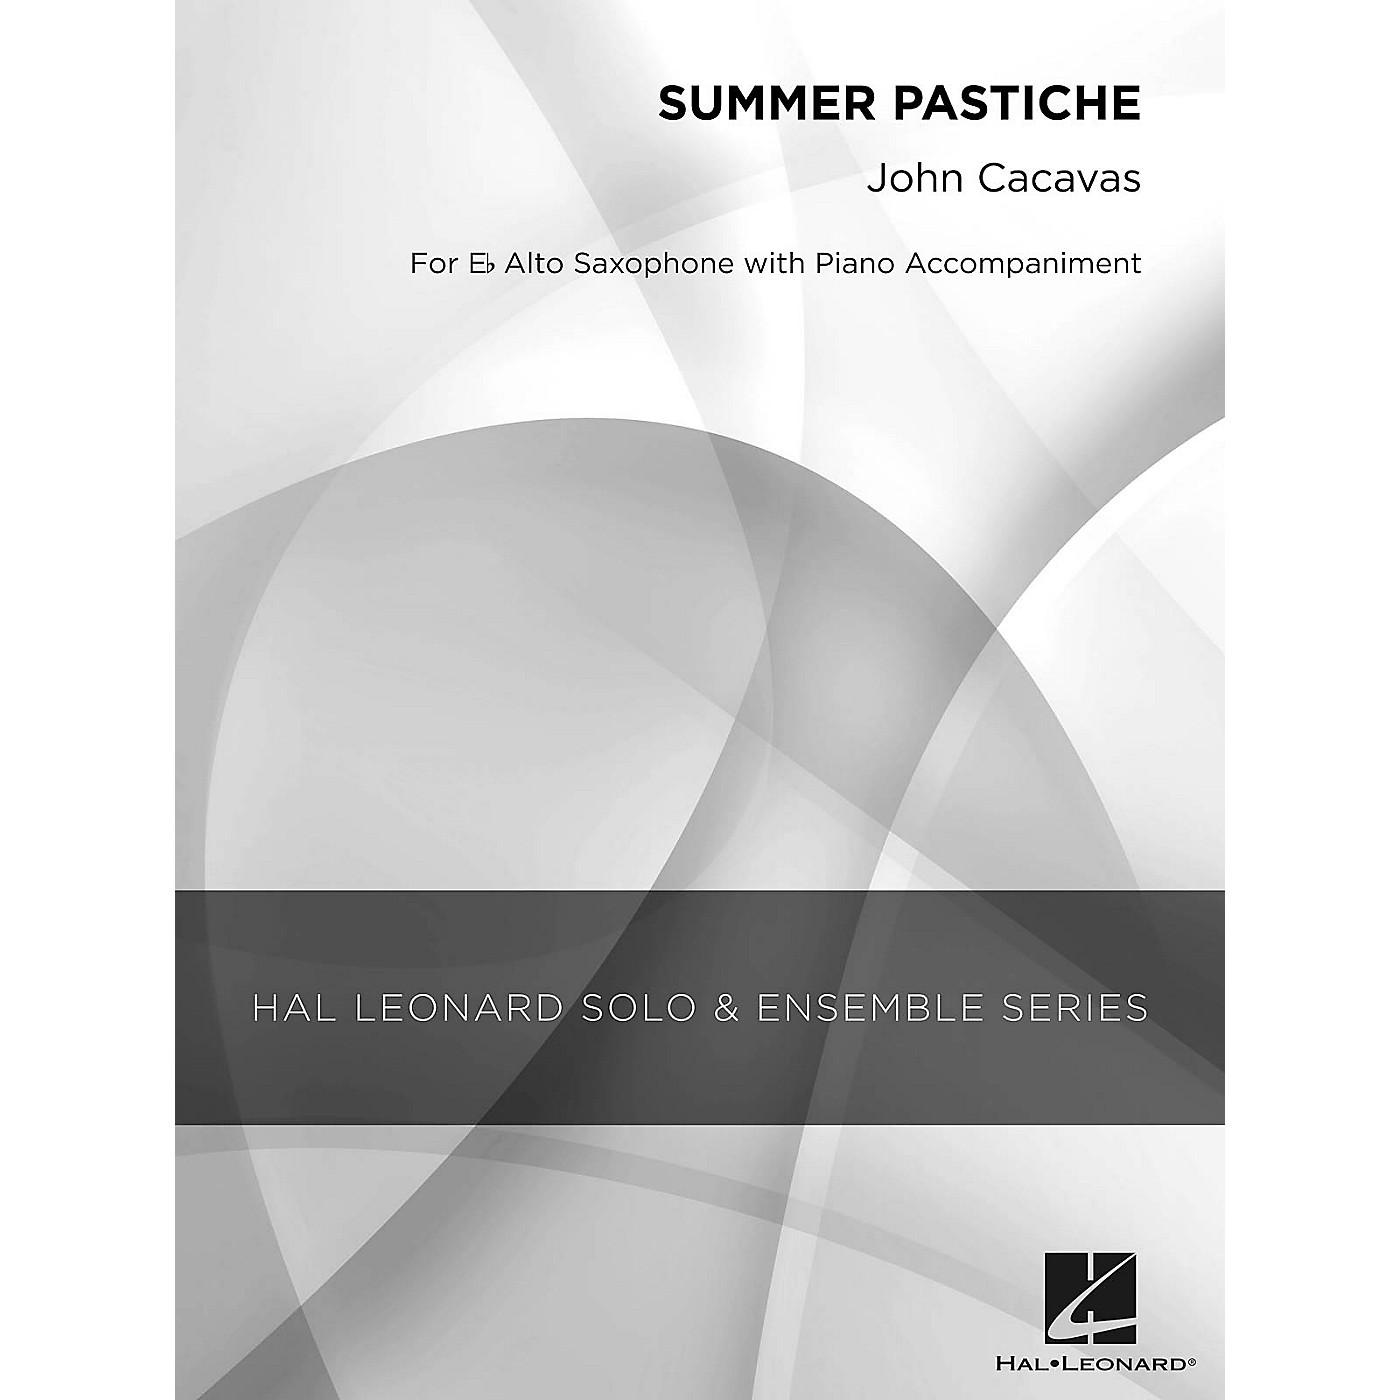 Hal Leonard Summer Pastiche (Grade 2.5 Alto Saxophone Solo) Concert Band Level 2.5 Composed by John Cacavas thumbnail